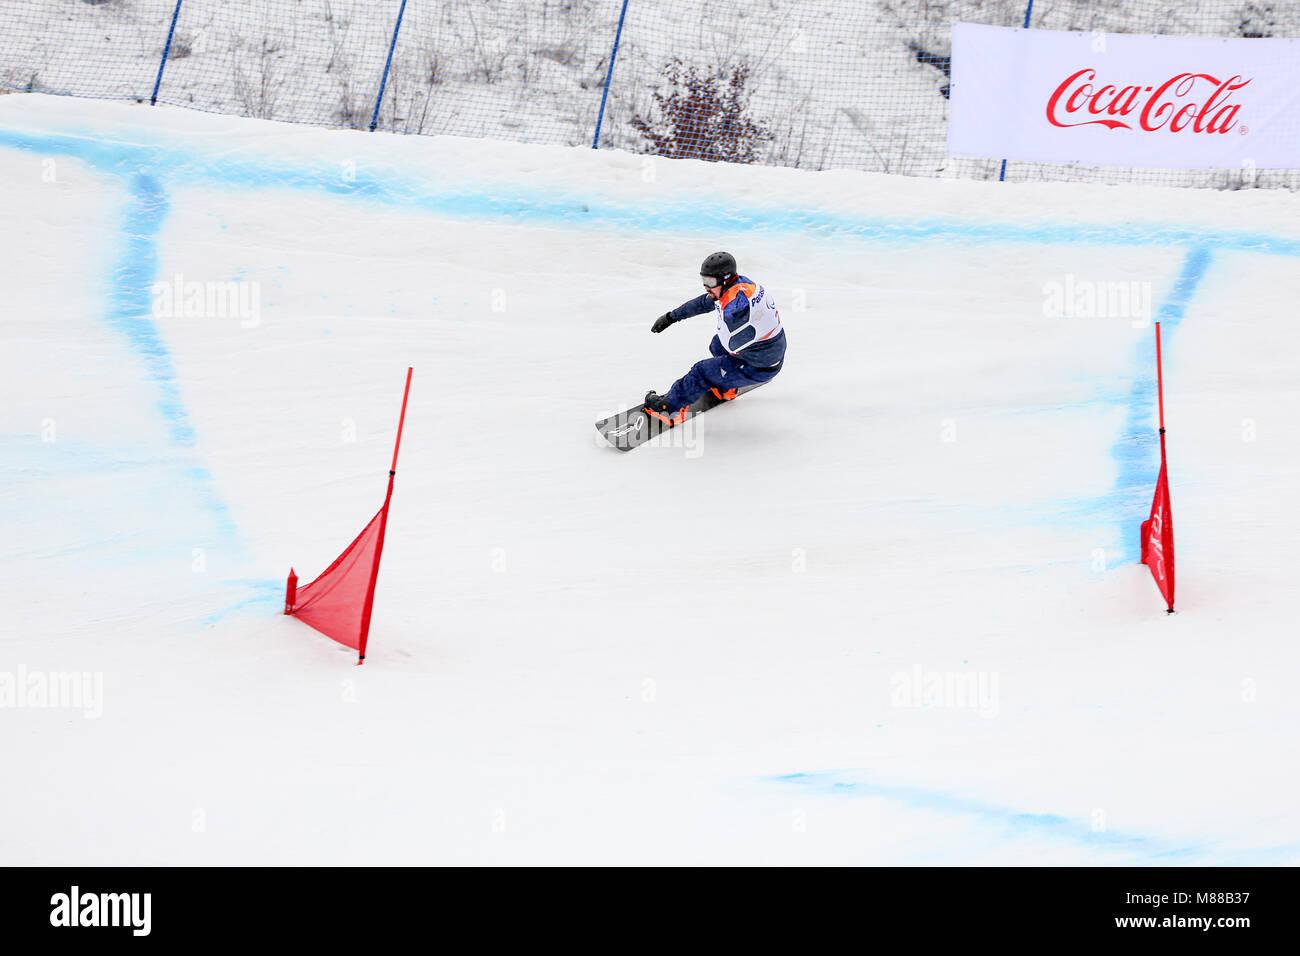 PyeongChang, South Korea. 16th March, 2018. Para Snowboard. Team GB ...